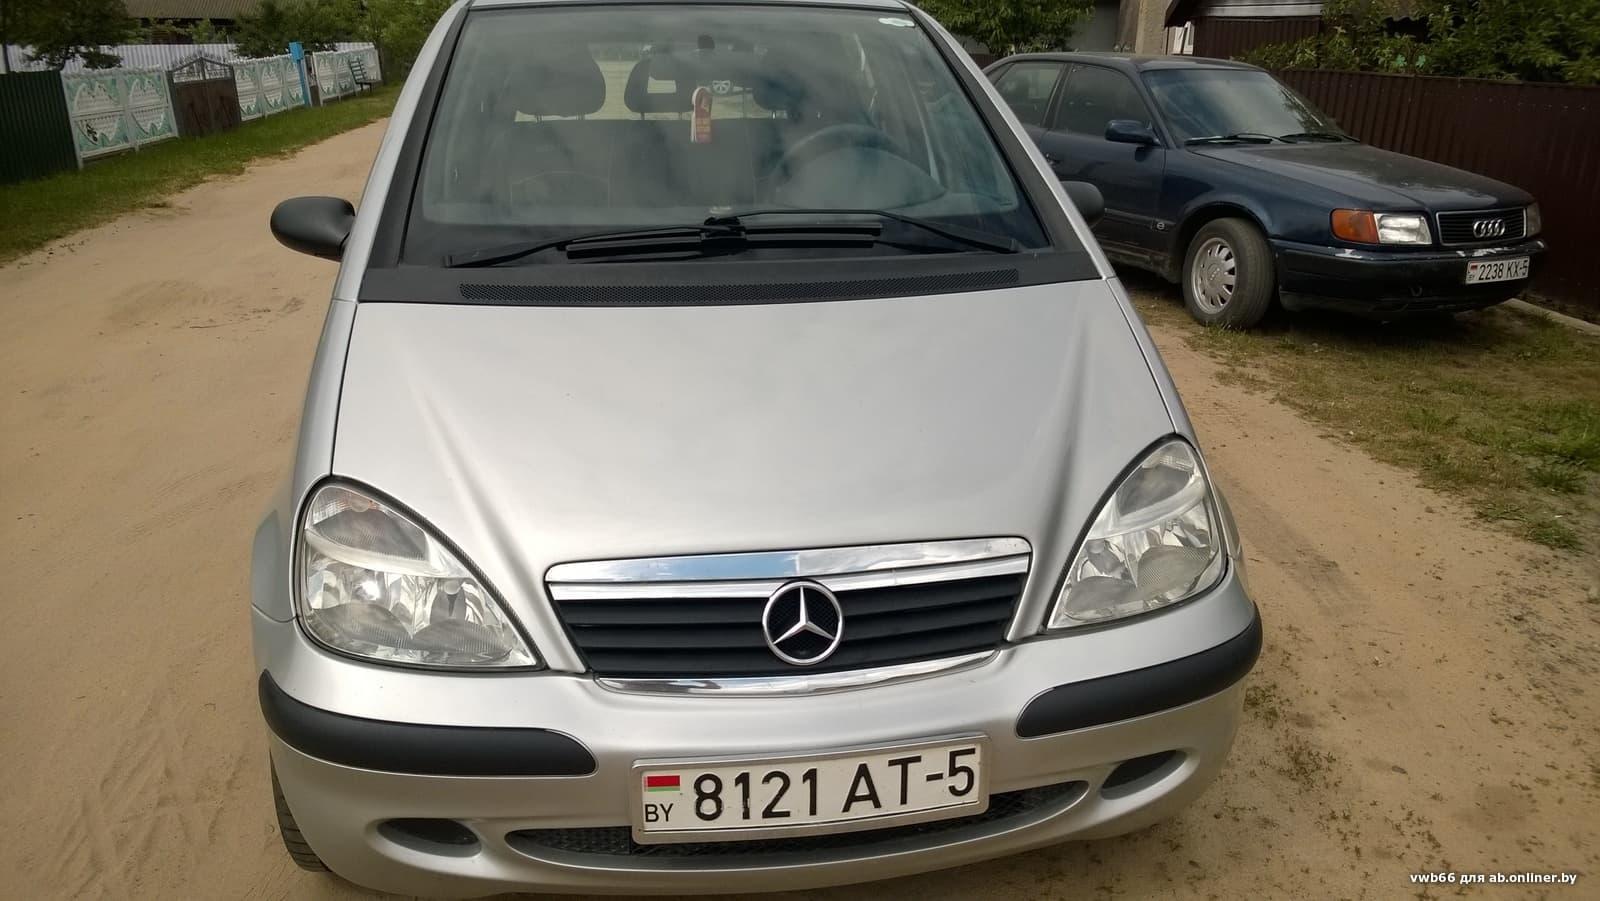 Mercedes A140 w168